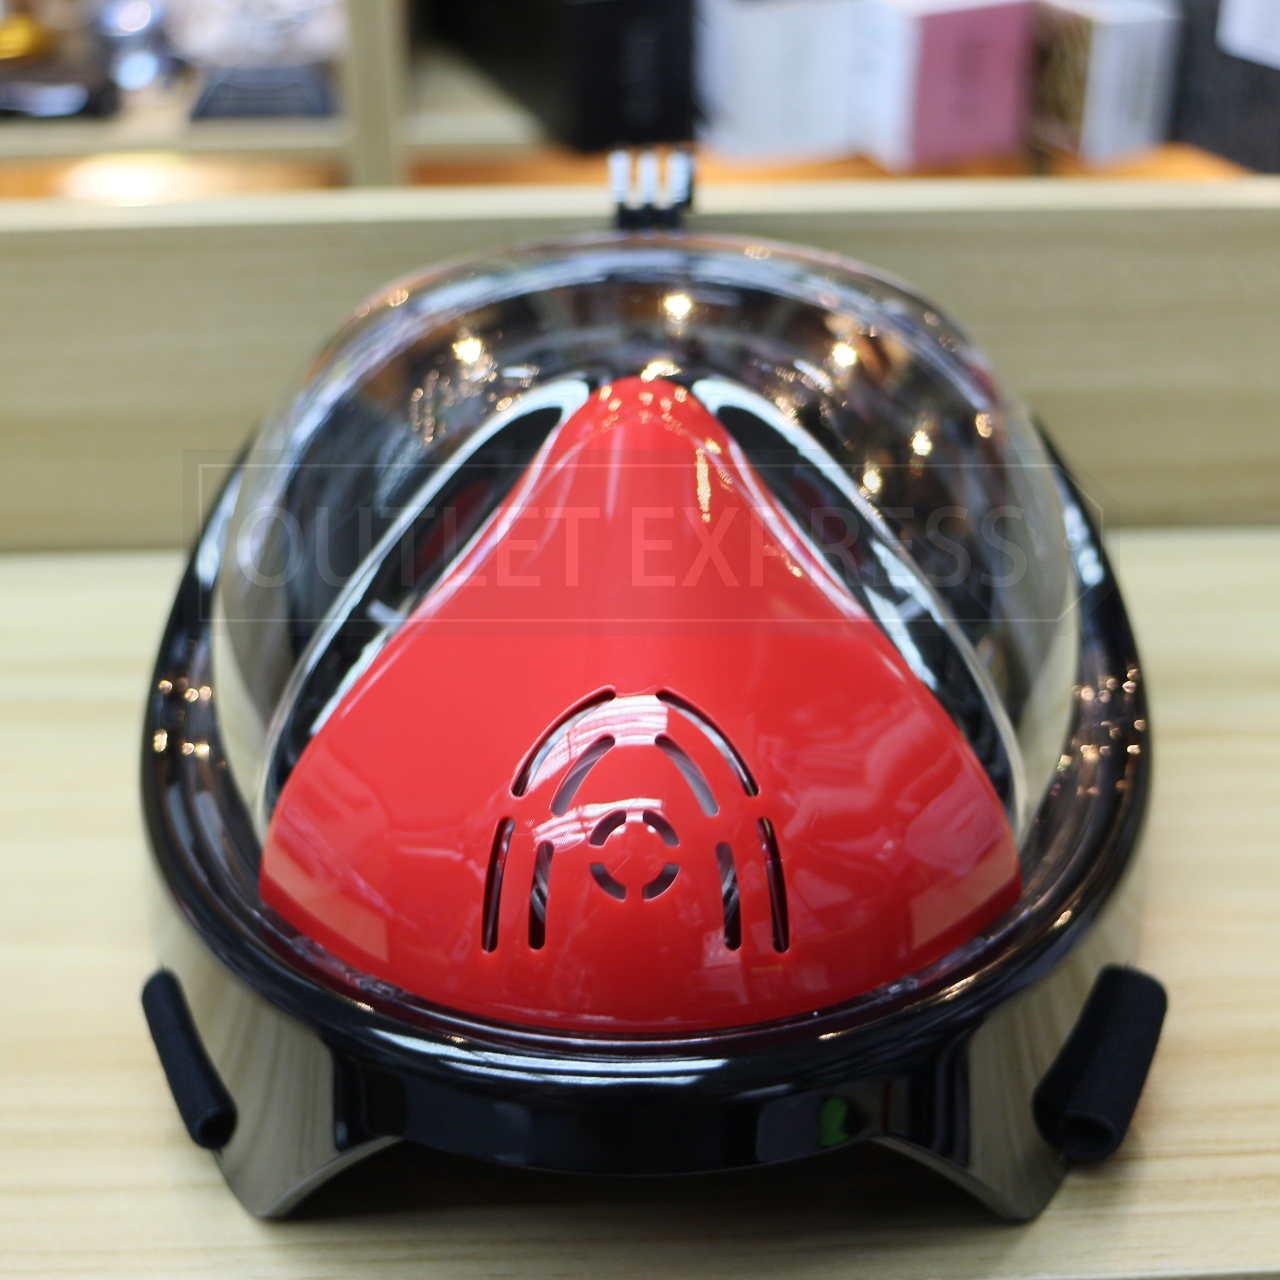 THENICE全乾式防霧浮潛面罩 頂部- Outlet Express HK生活百貨城實拍相片